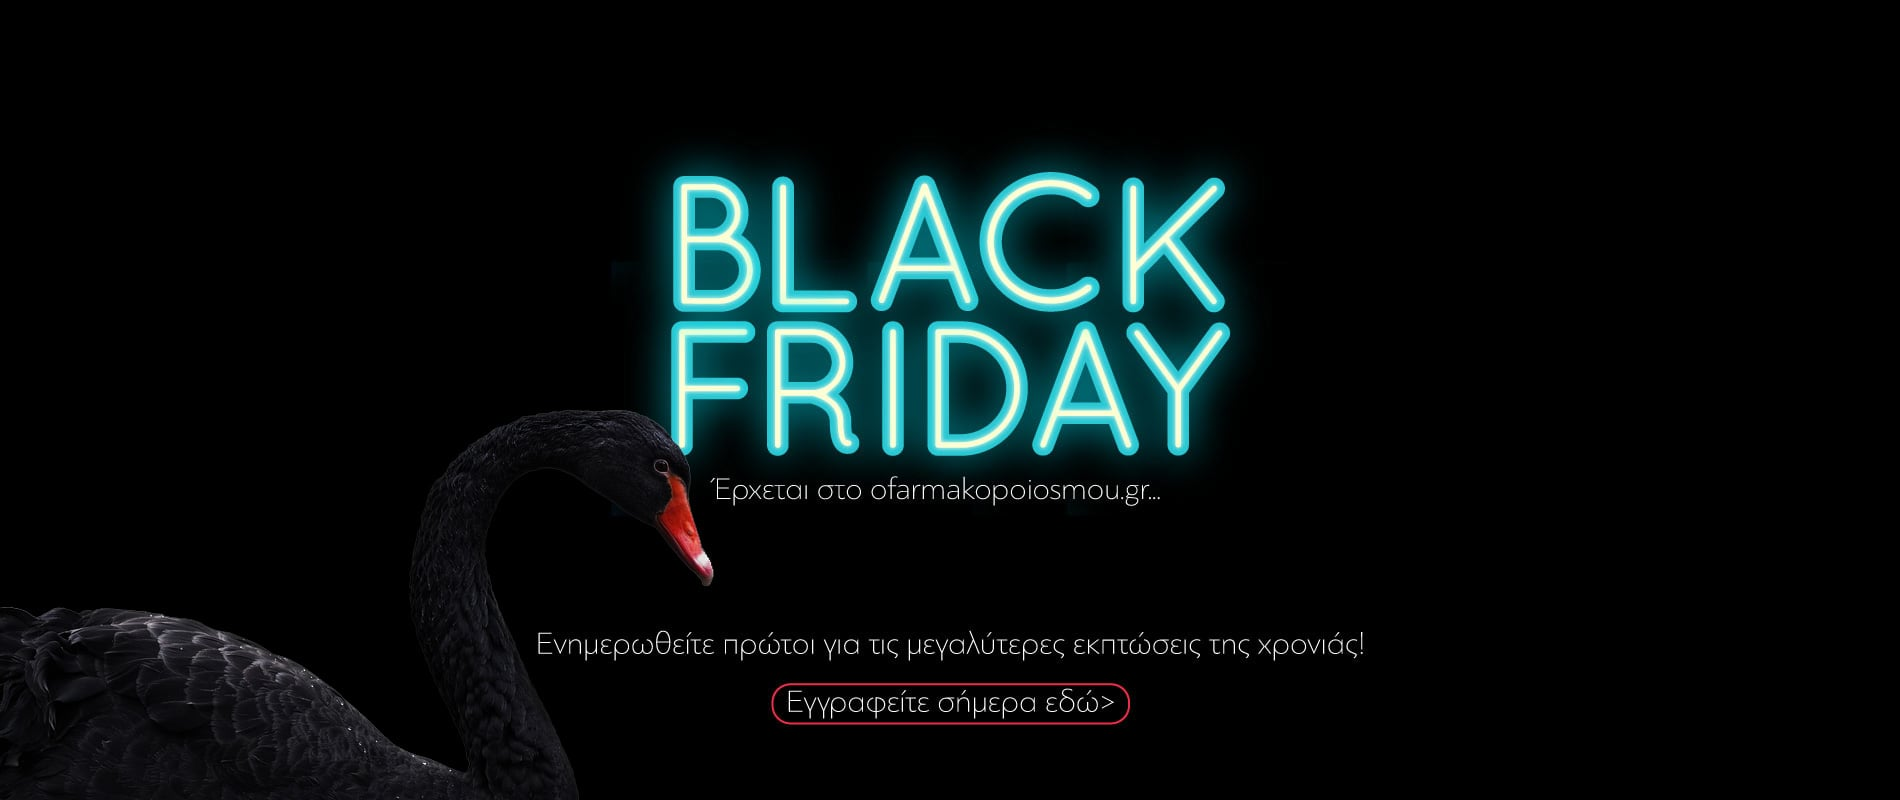 https://www.ofarmakopoiosmou.gr/sites/default/files/blackfriday_gr_slide.jpg